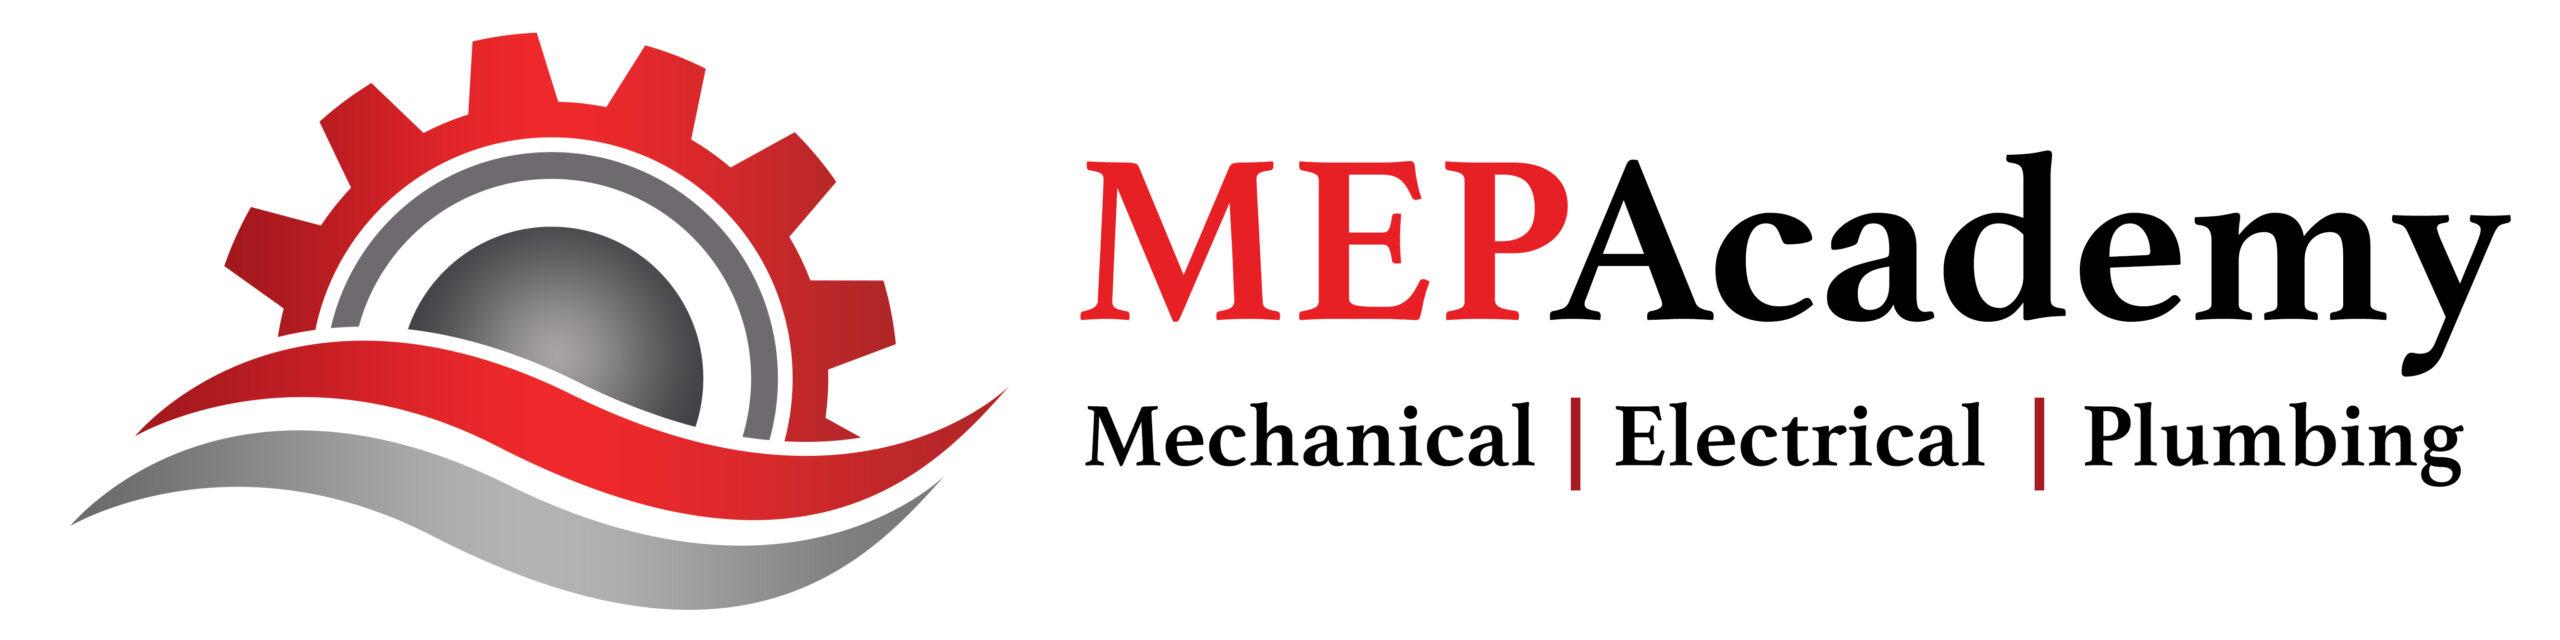 MEP Academy Logo